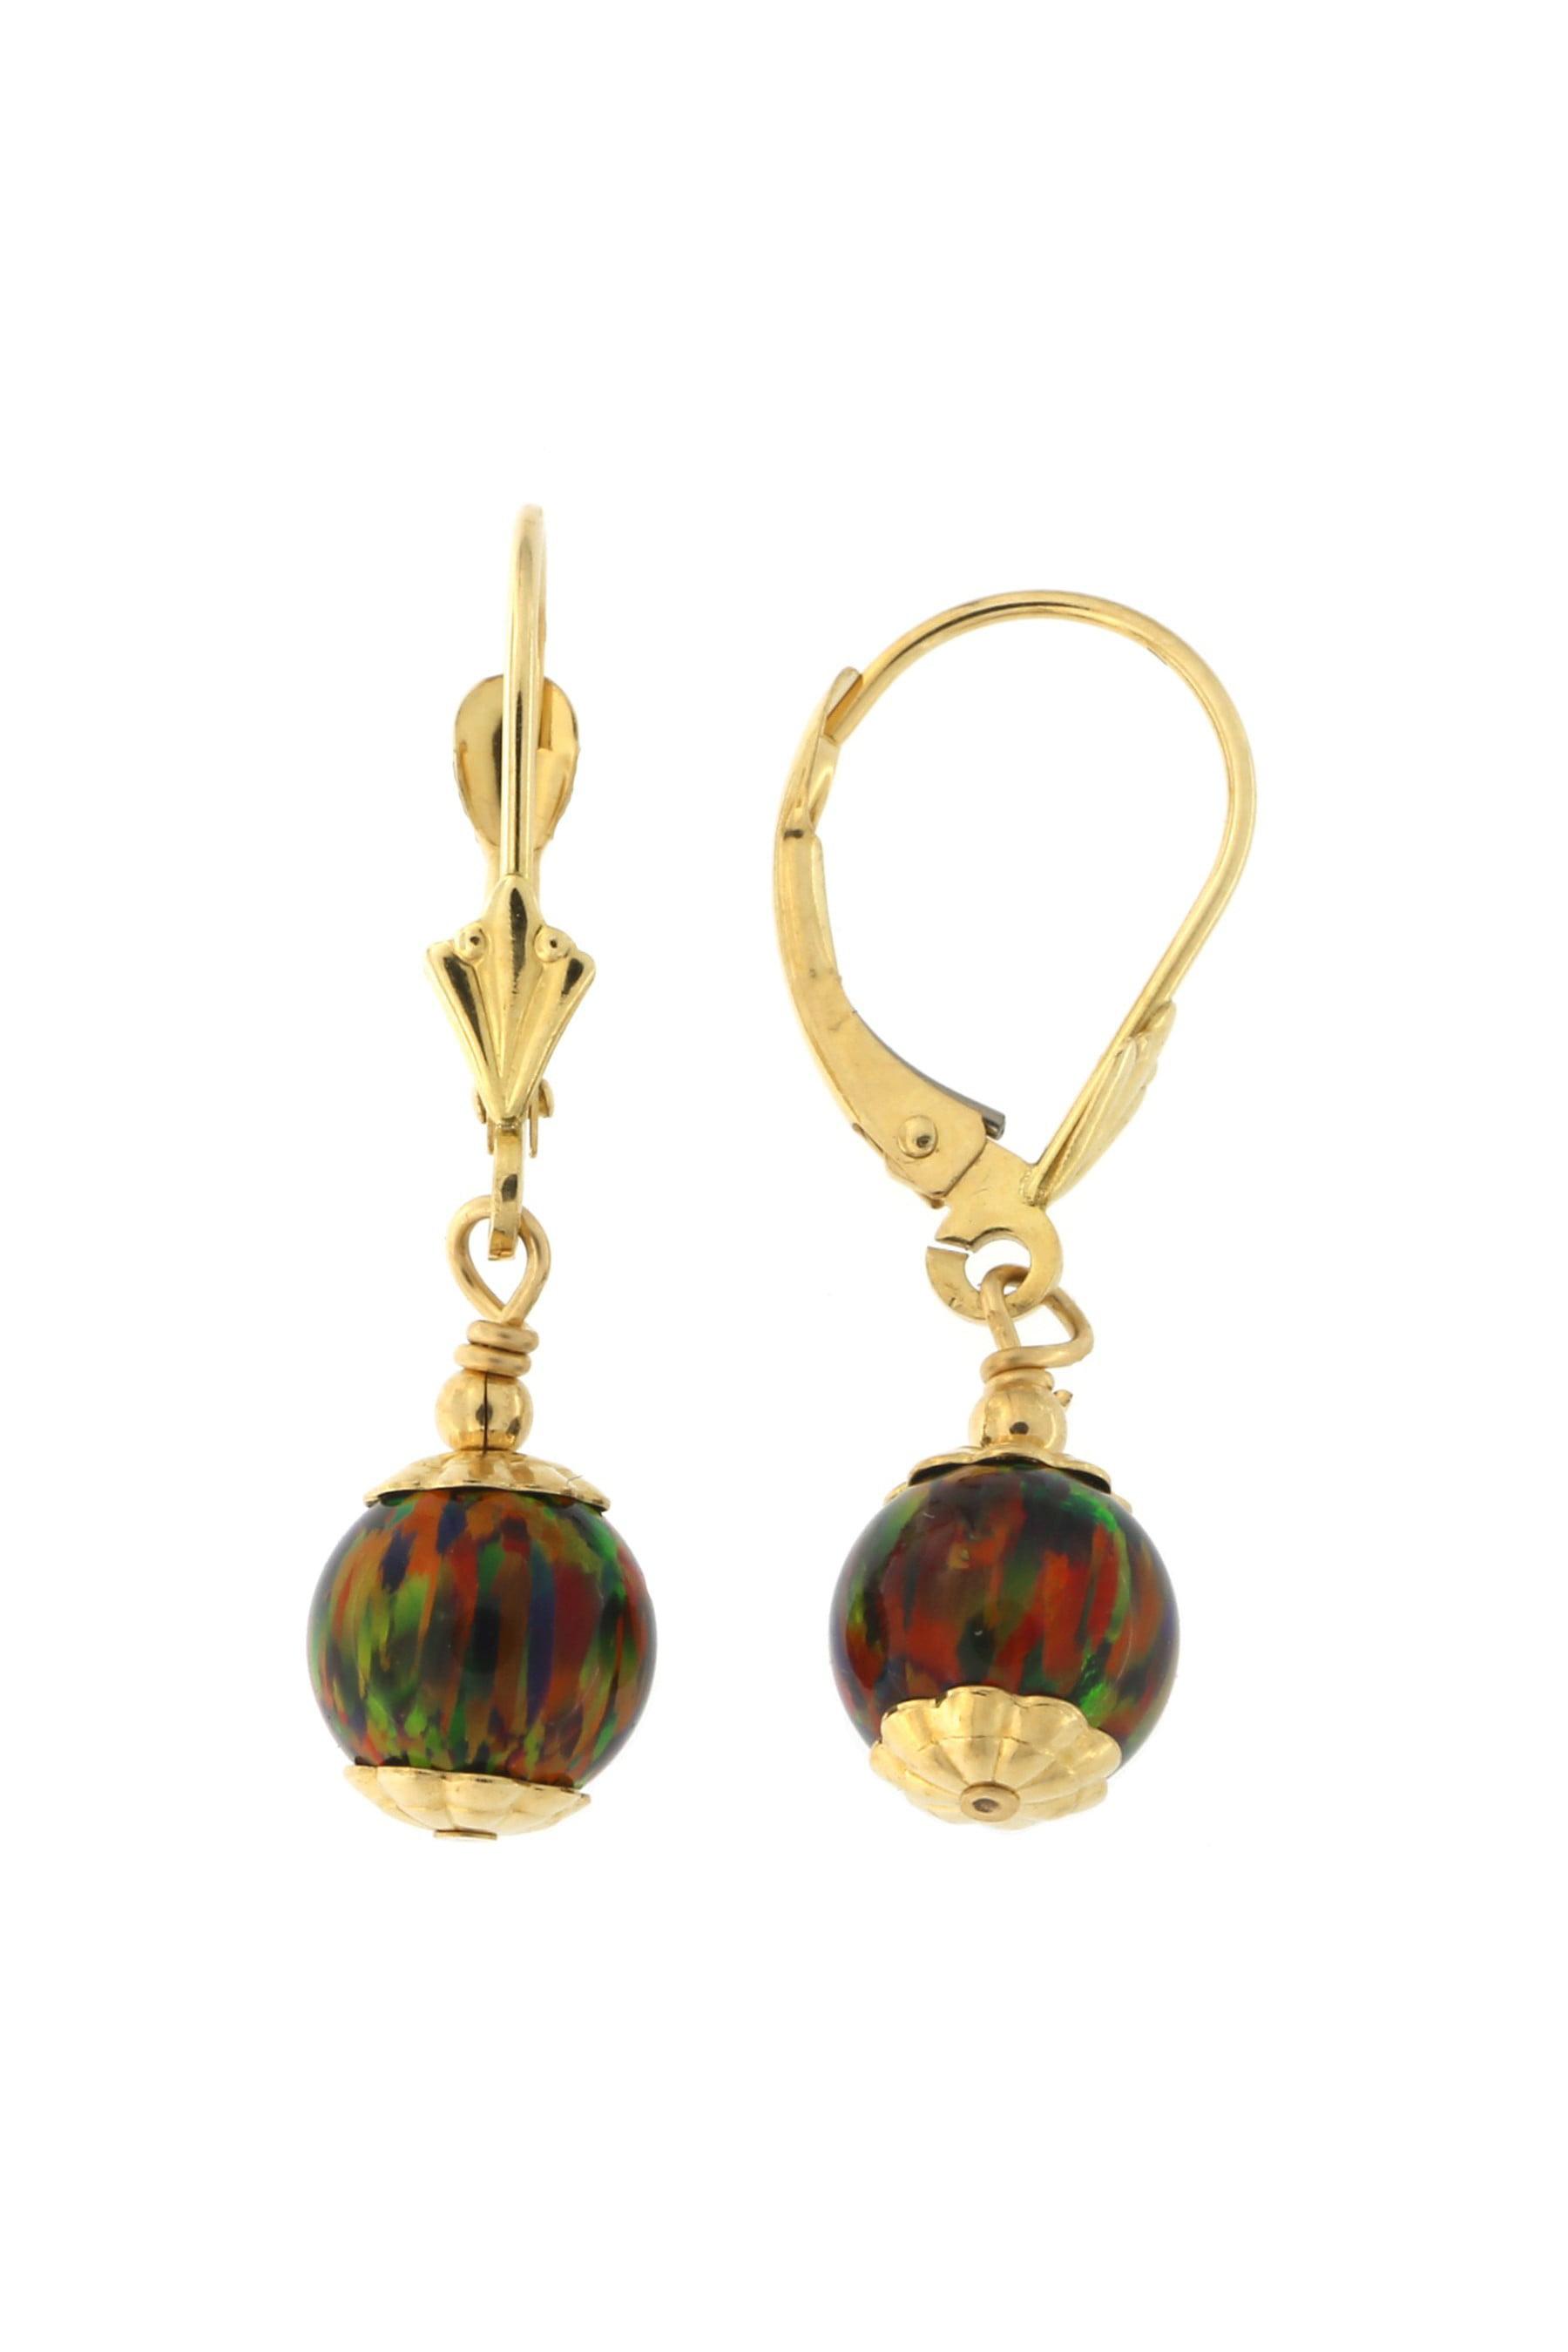 14k Yellow Gold 7mm Simulated Opal Leverback Dangle Earrings